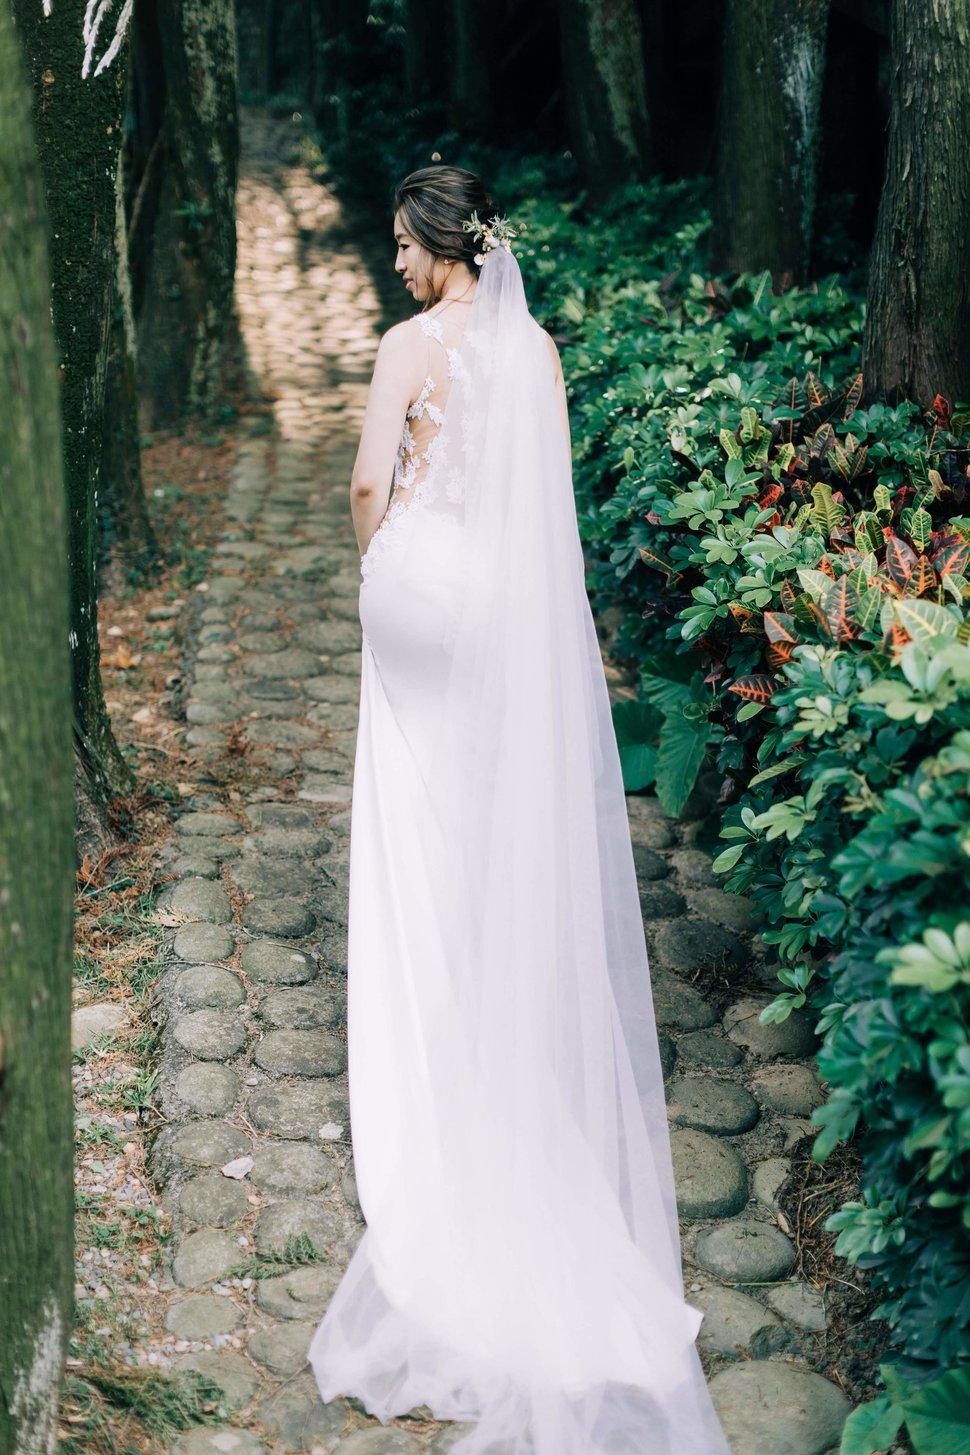 AG3_7022A - Cradle Wedding搖籃手工婚紗《結婚吧》